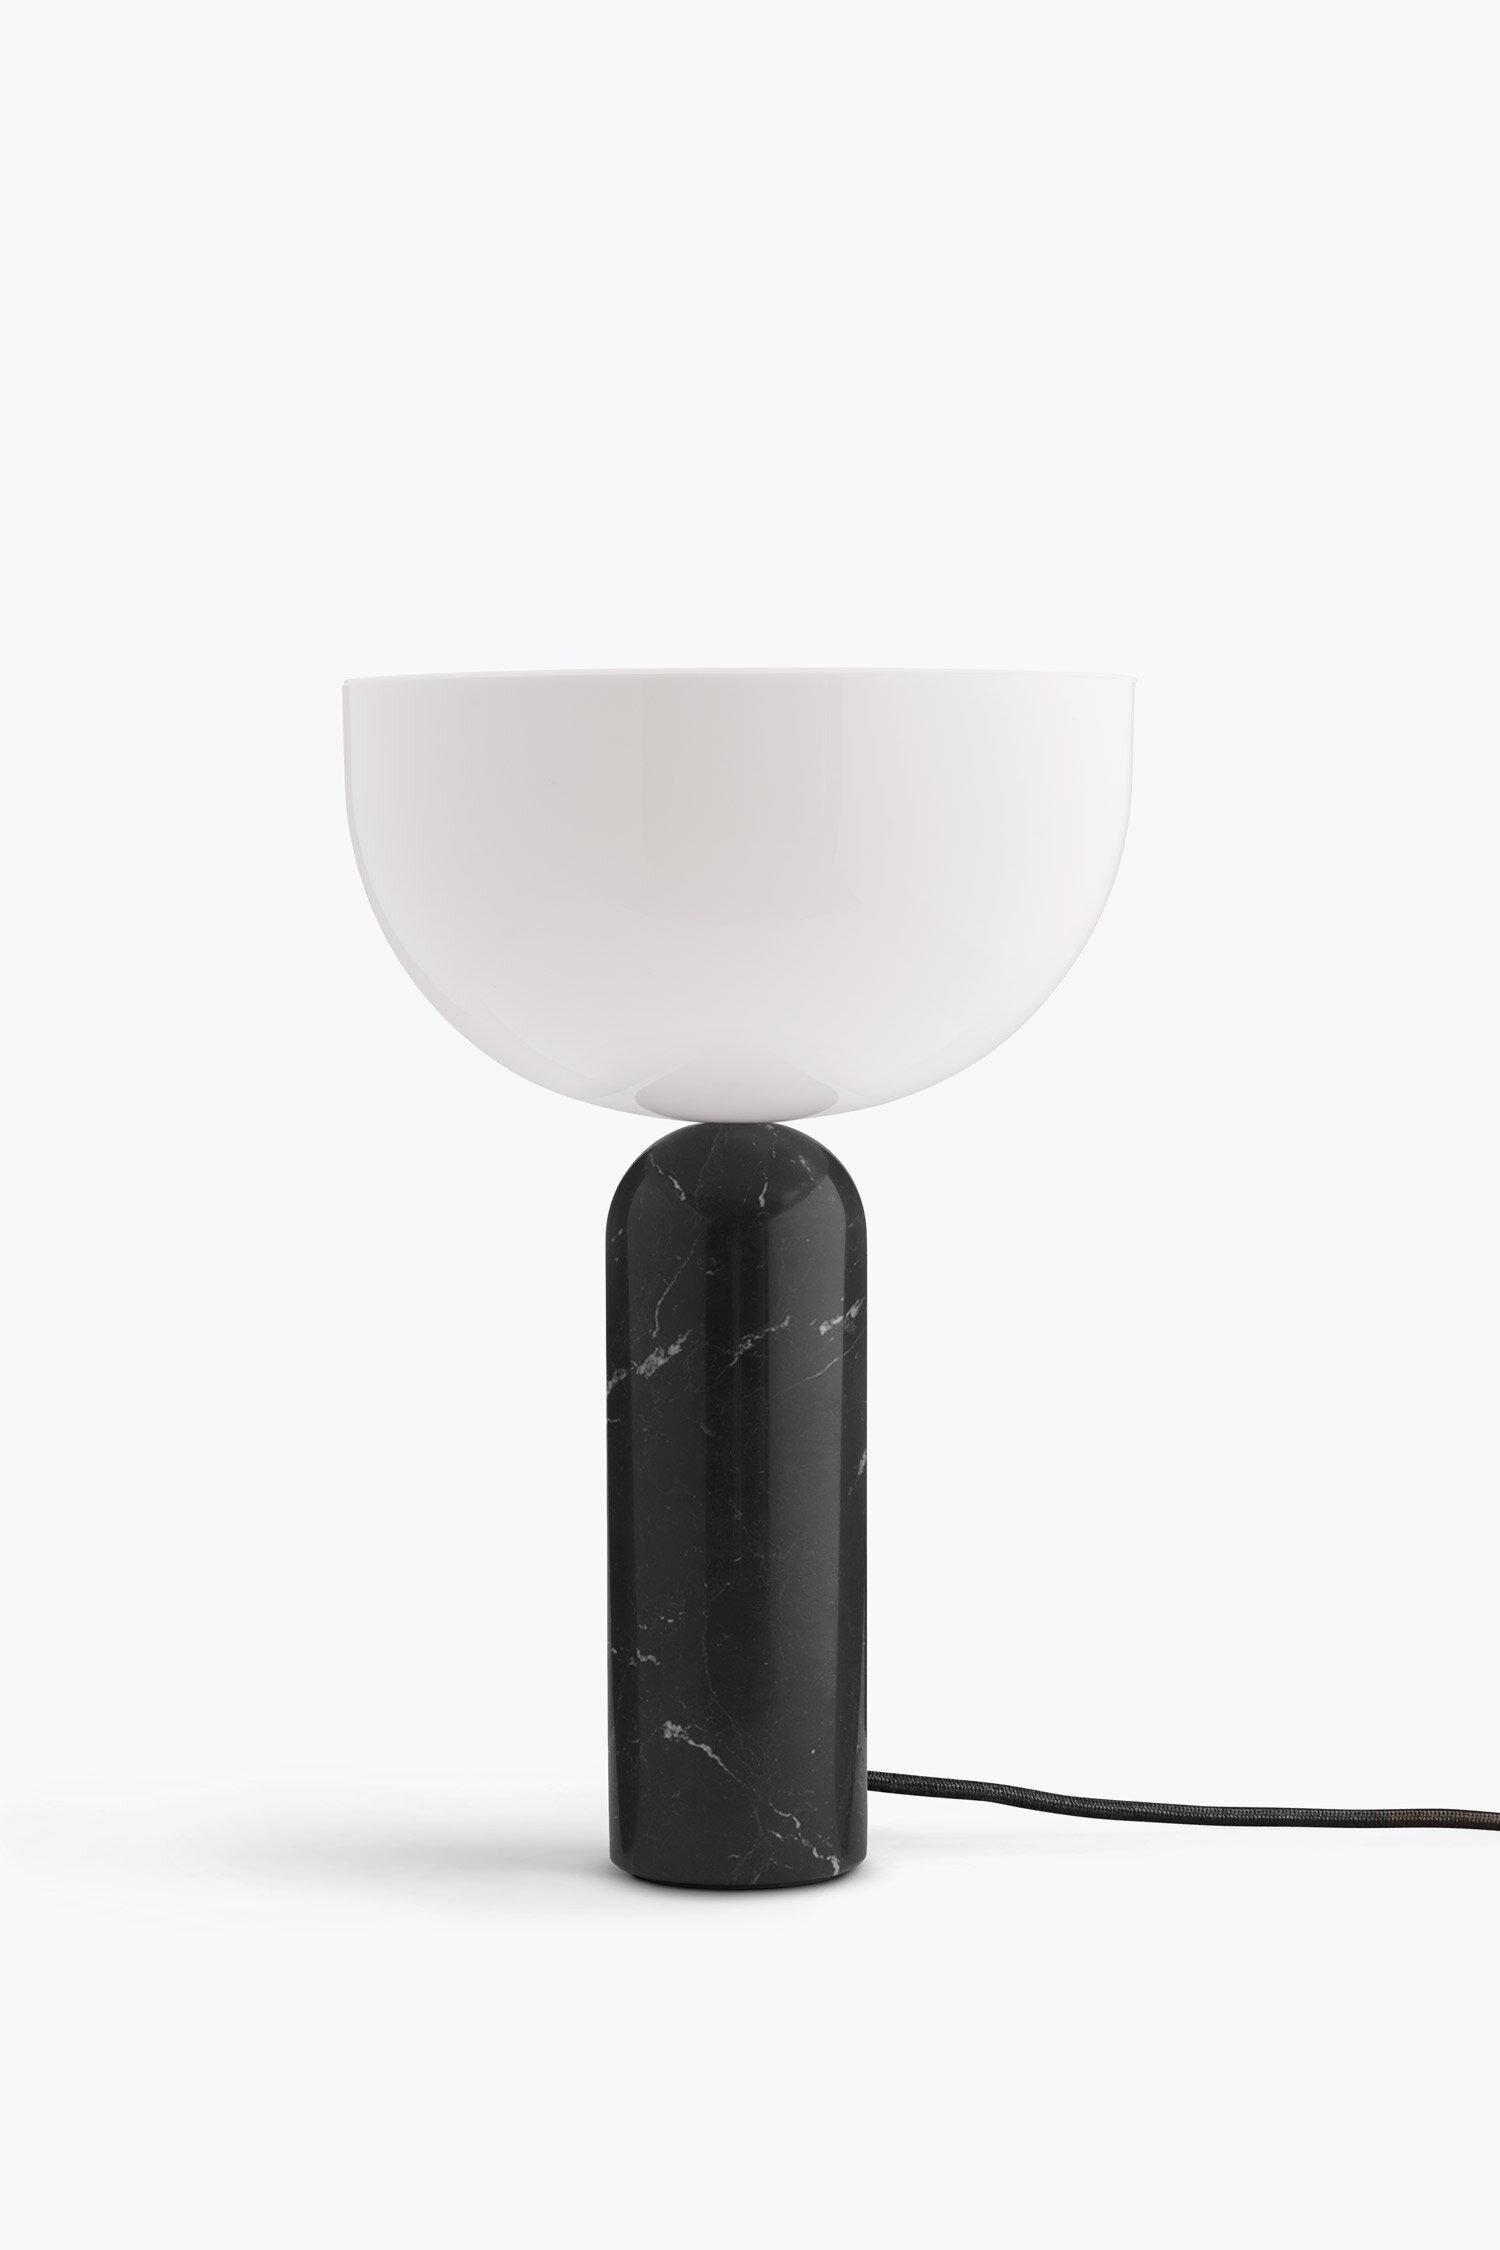 Kizu Table Lamp Black Marble, Large — New Works